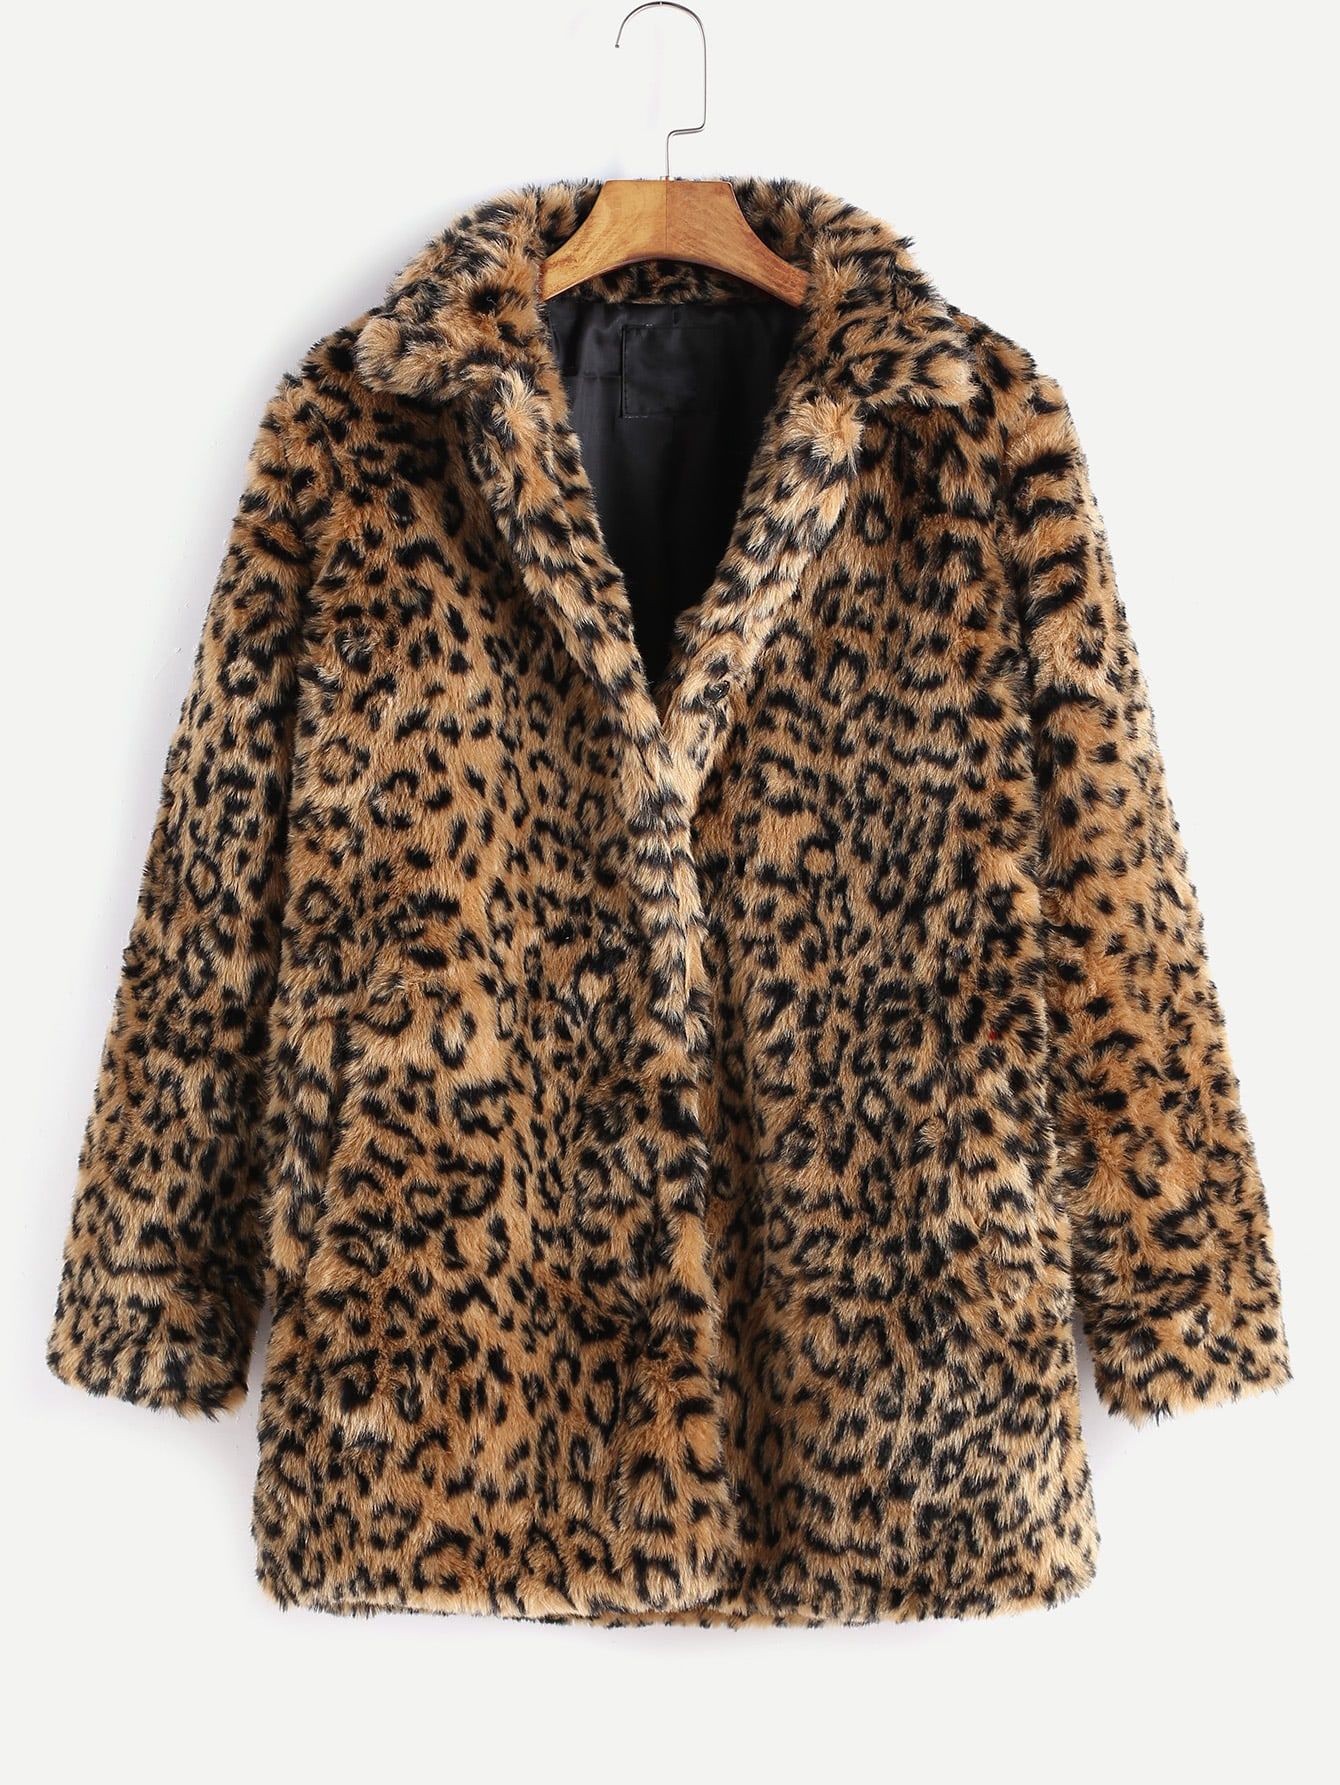 Coats Khaki Faux Fur Collar Elegant Single Breasted Short Winter Leopard Long Sleeve Outerwear.